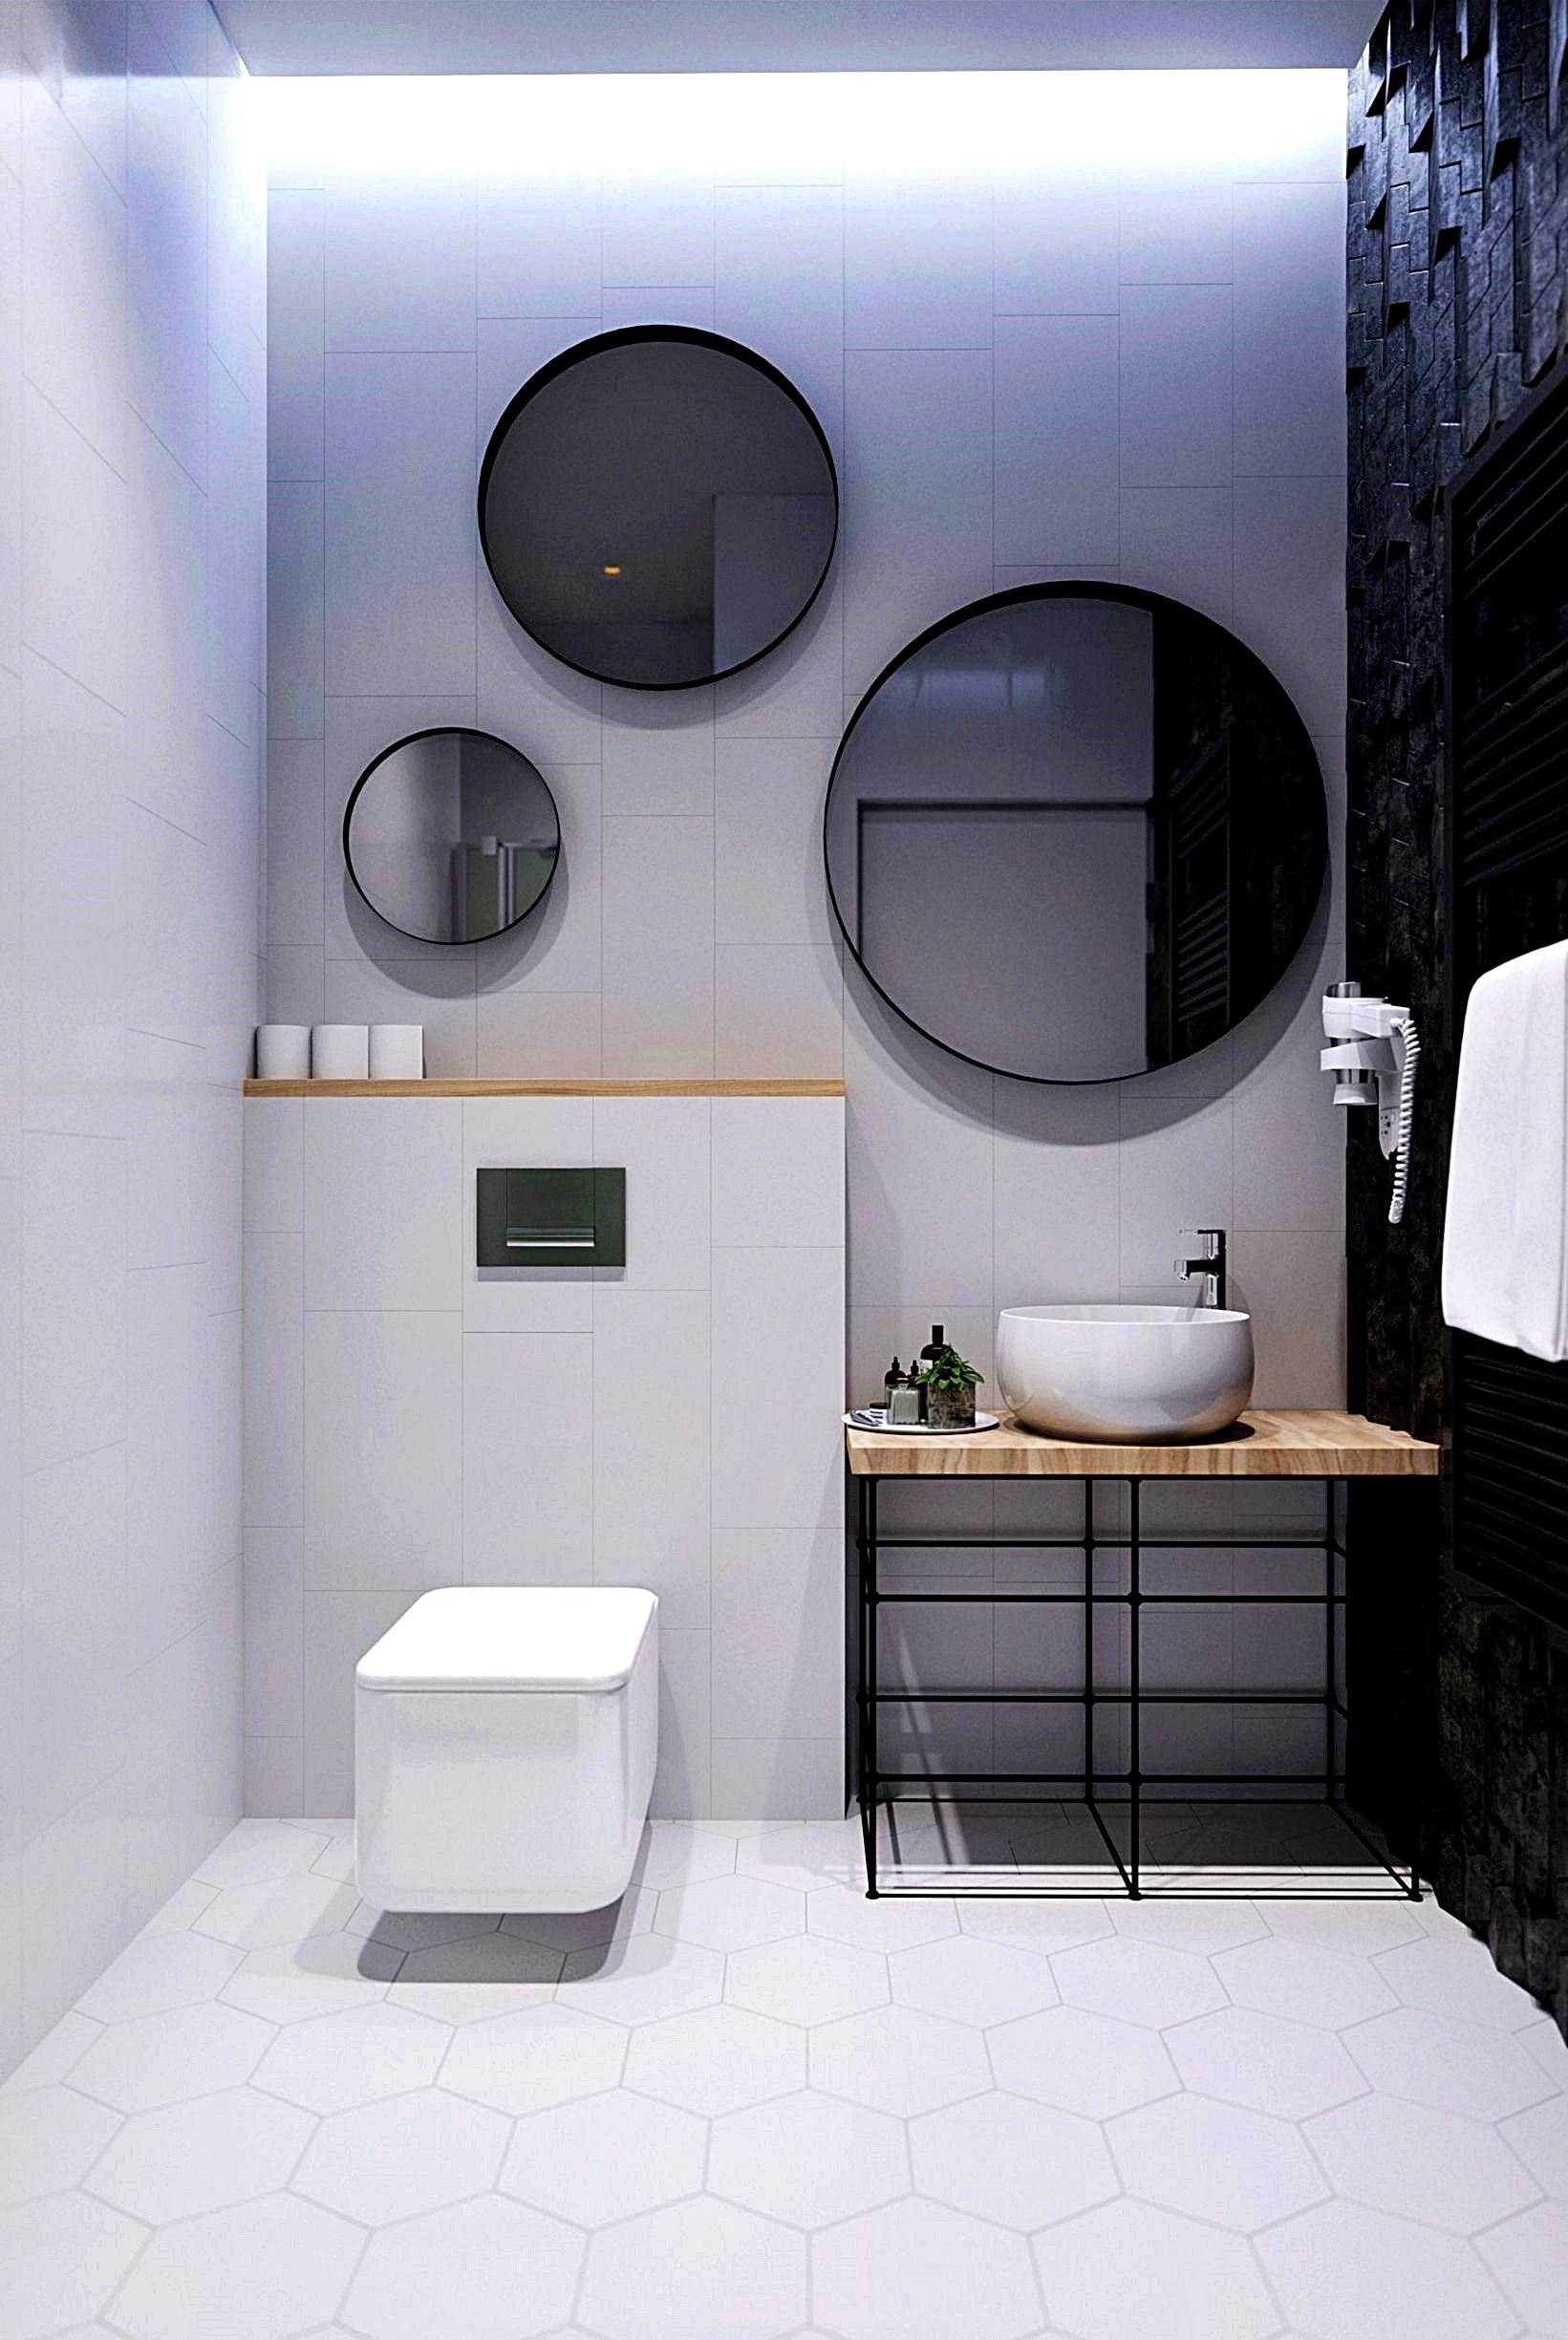 Bathroom Remodel Ideas Many Folks Desire To Redecorate But They Have No Idea How You Bathroom Sink Design Bathroom Mirror Design Minimalist Bathroom Mirrors